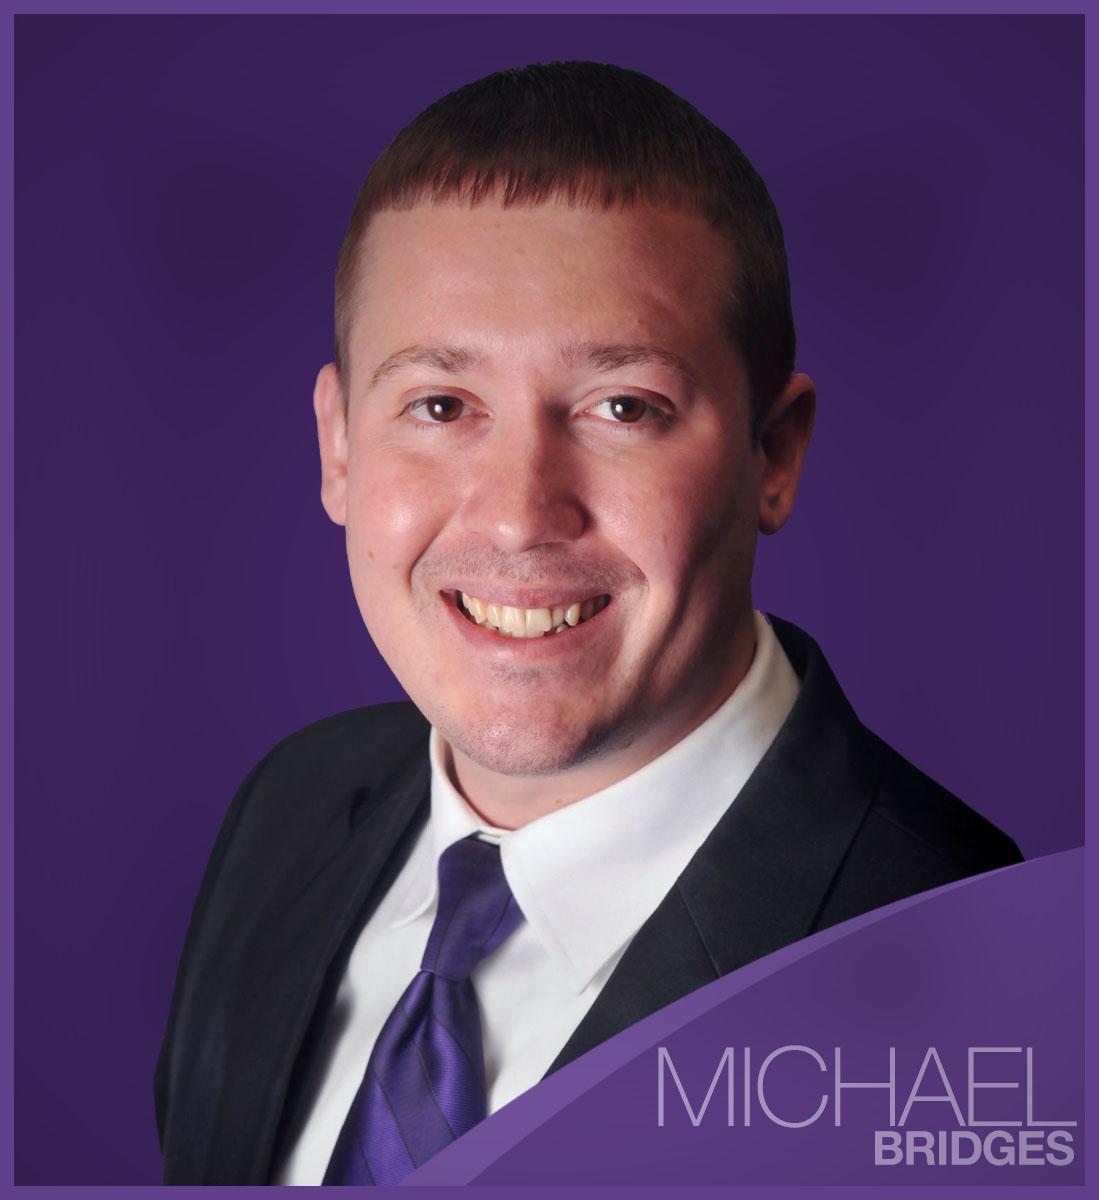 Michael Bridges